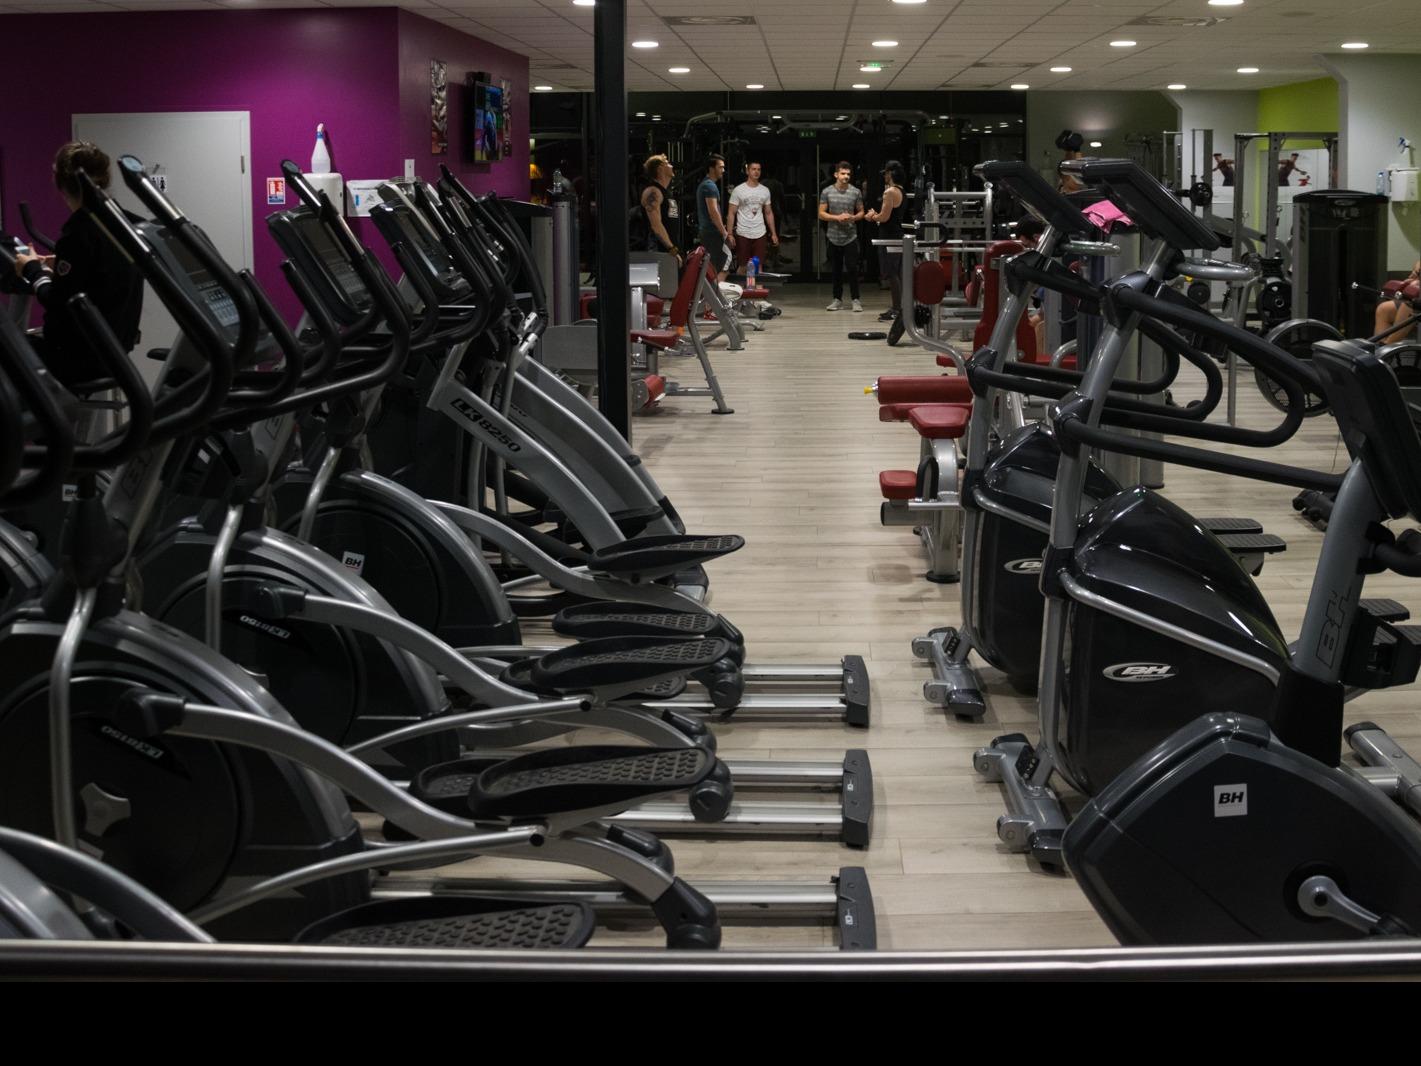 Fitness Club Concept Brumath Tarifs Avis Horaires Essai Gratuit